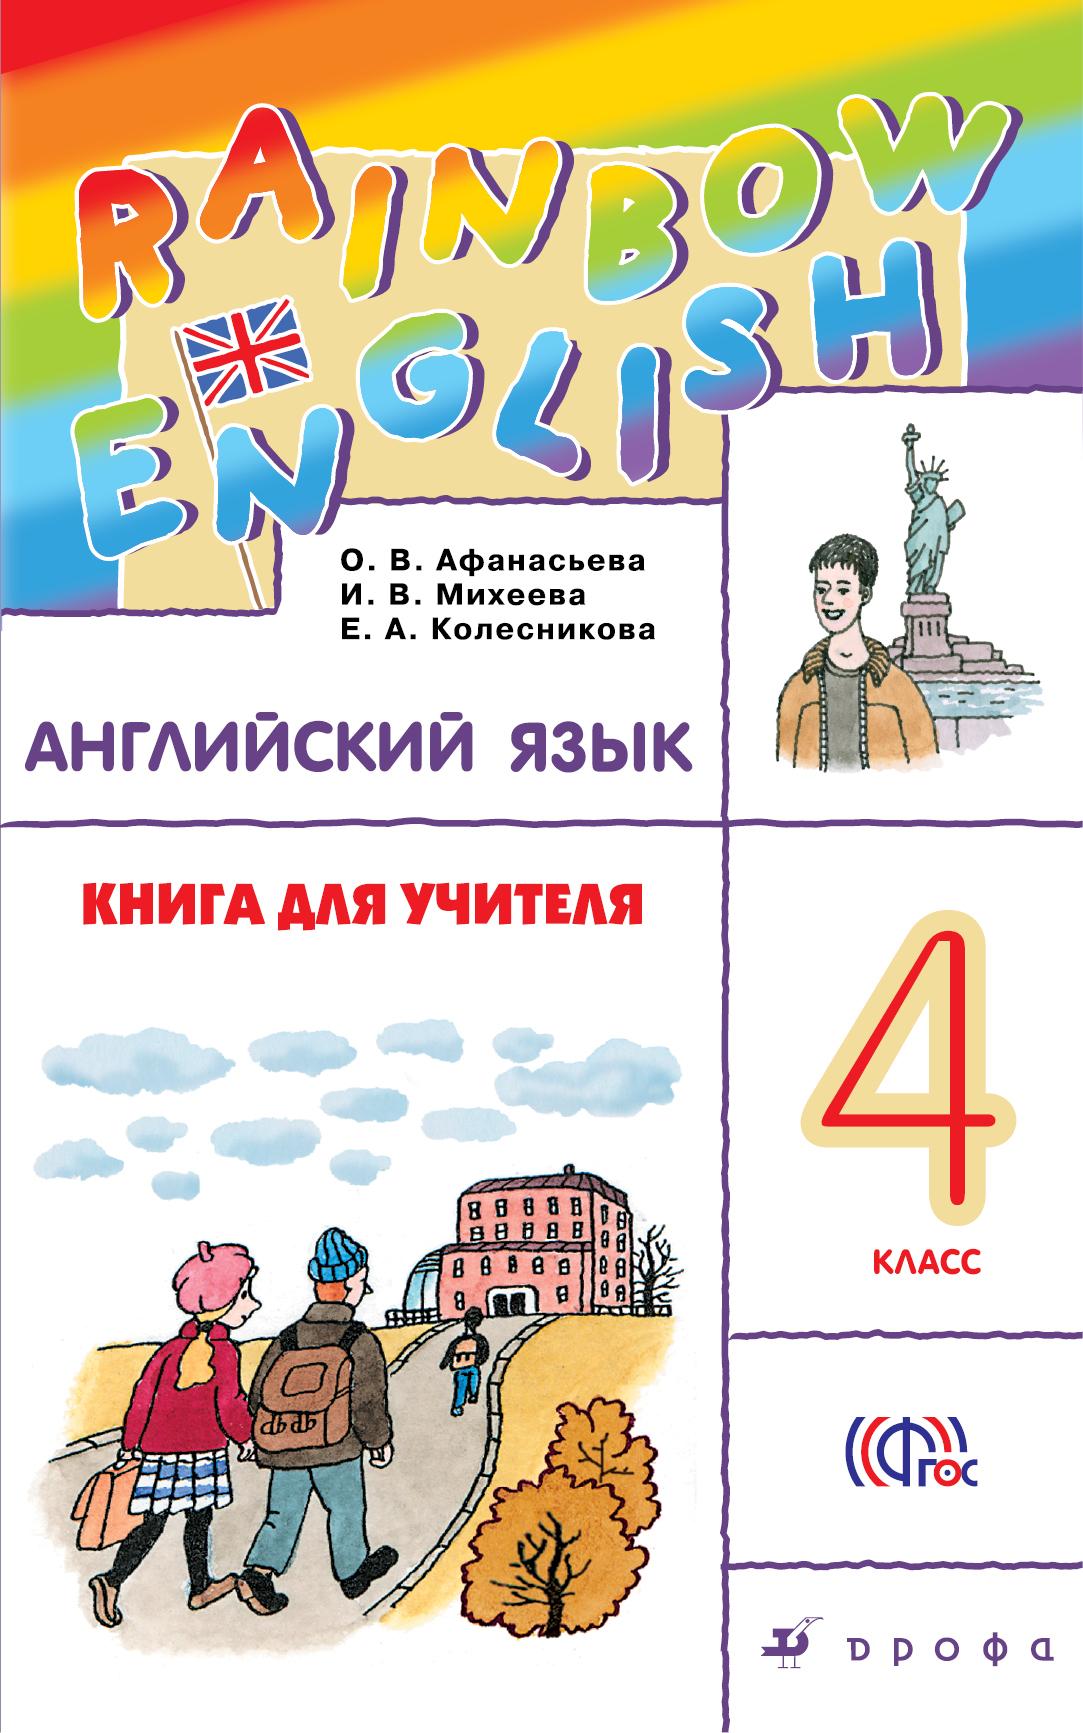 О. В. Афанасьева, И. В. Михеева, Е. А. Колесникова Английский язык. 4 класс. Книга для учителя